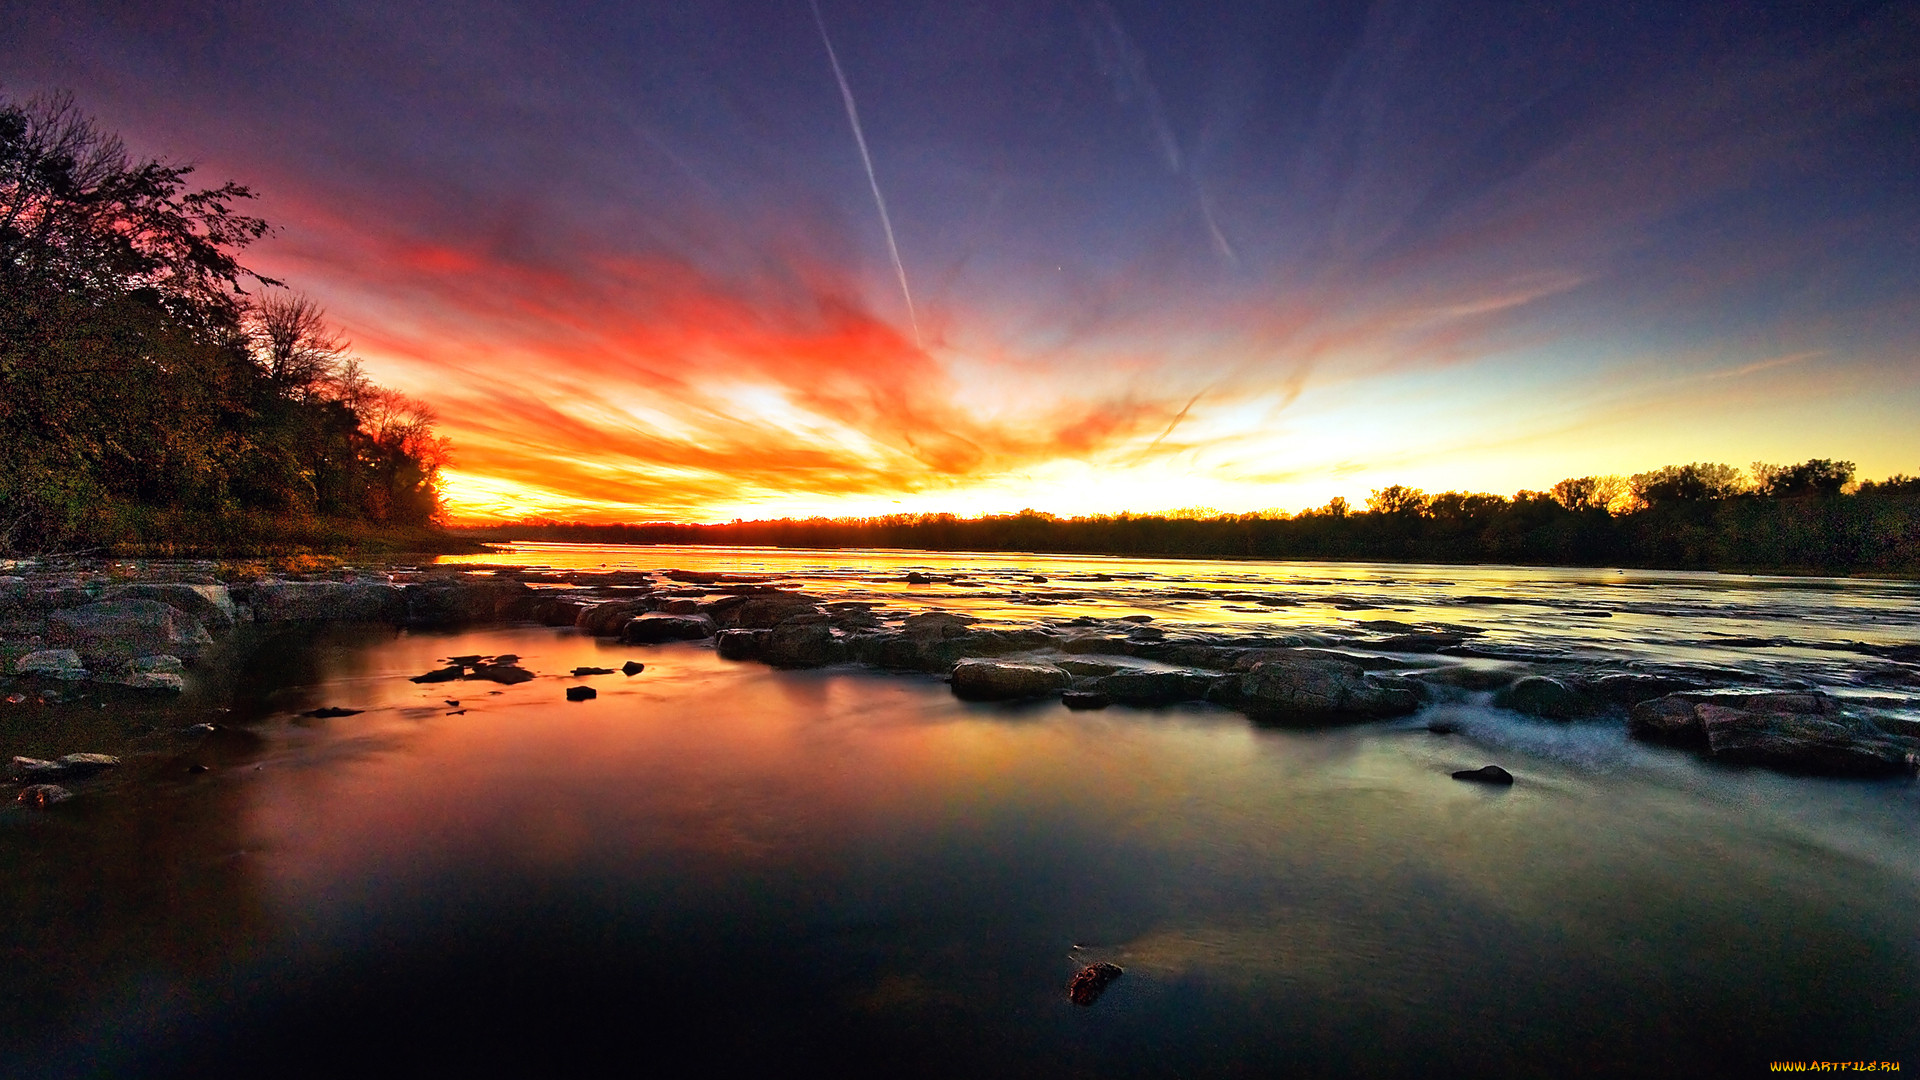 природа, восходы, закаты, пейзаж, закат, река